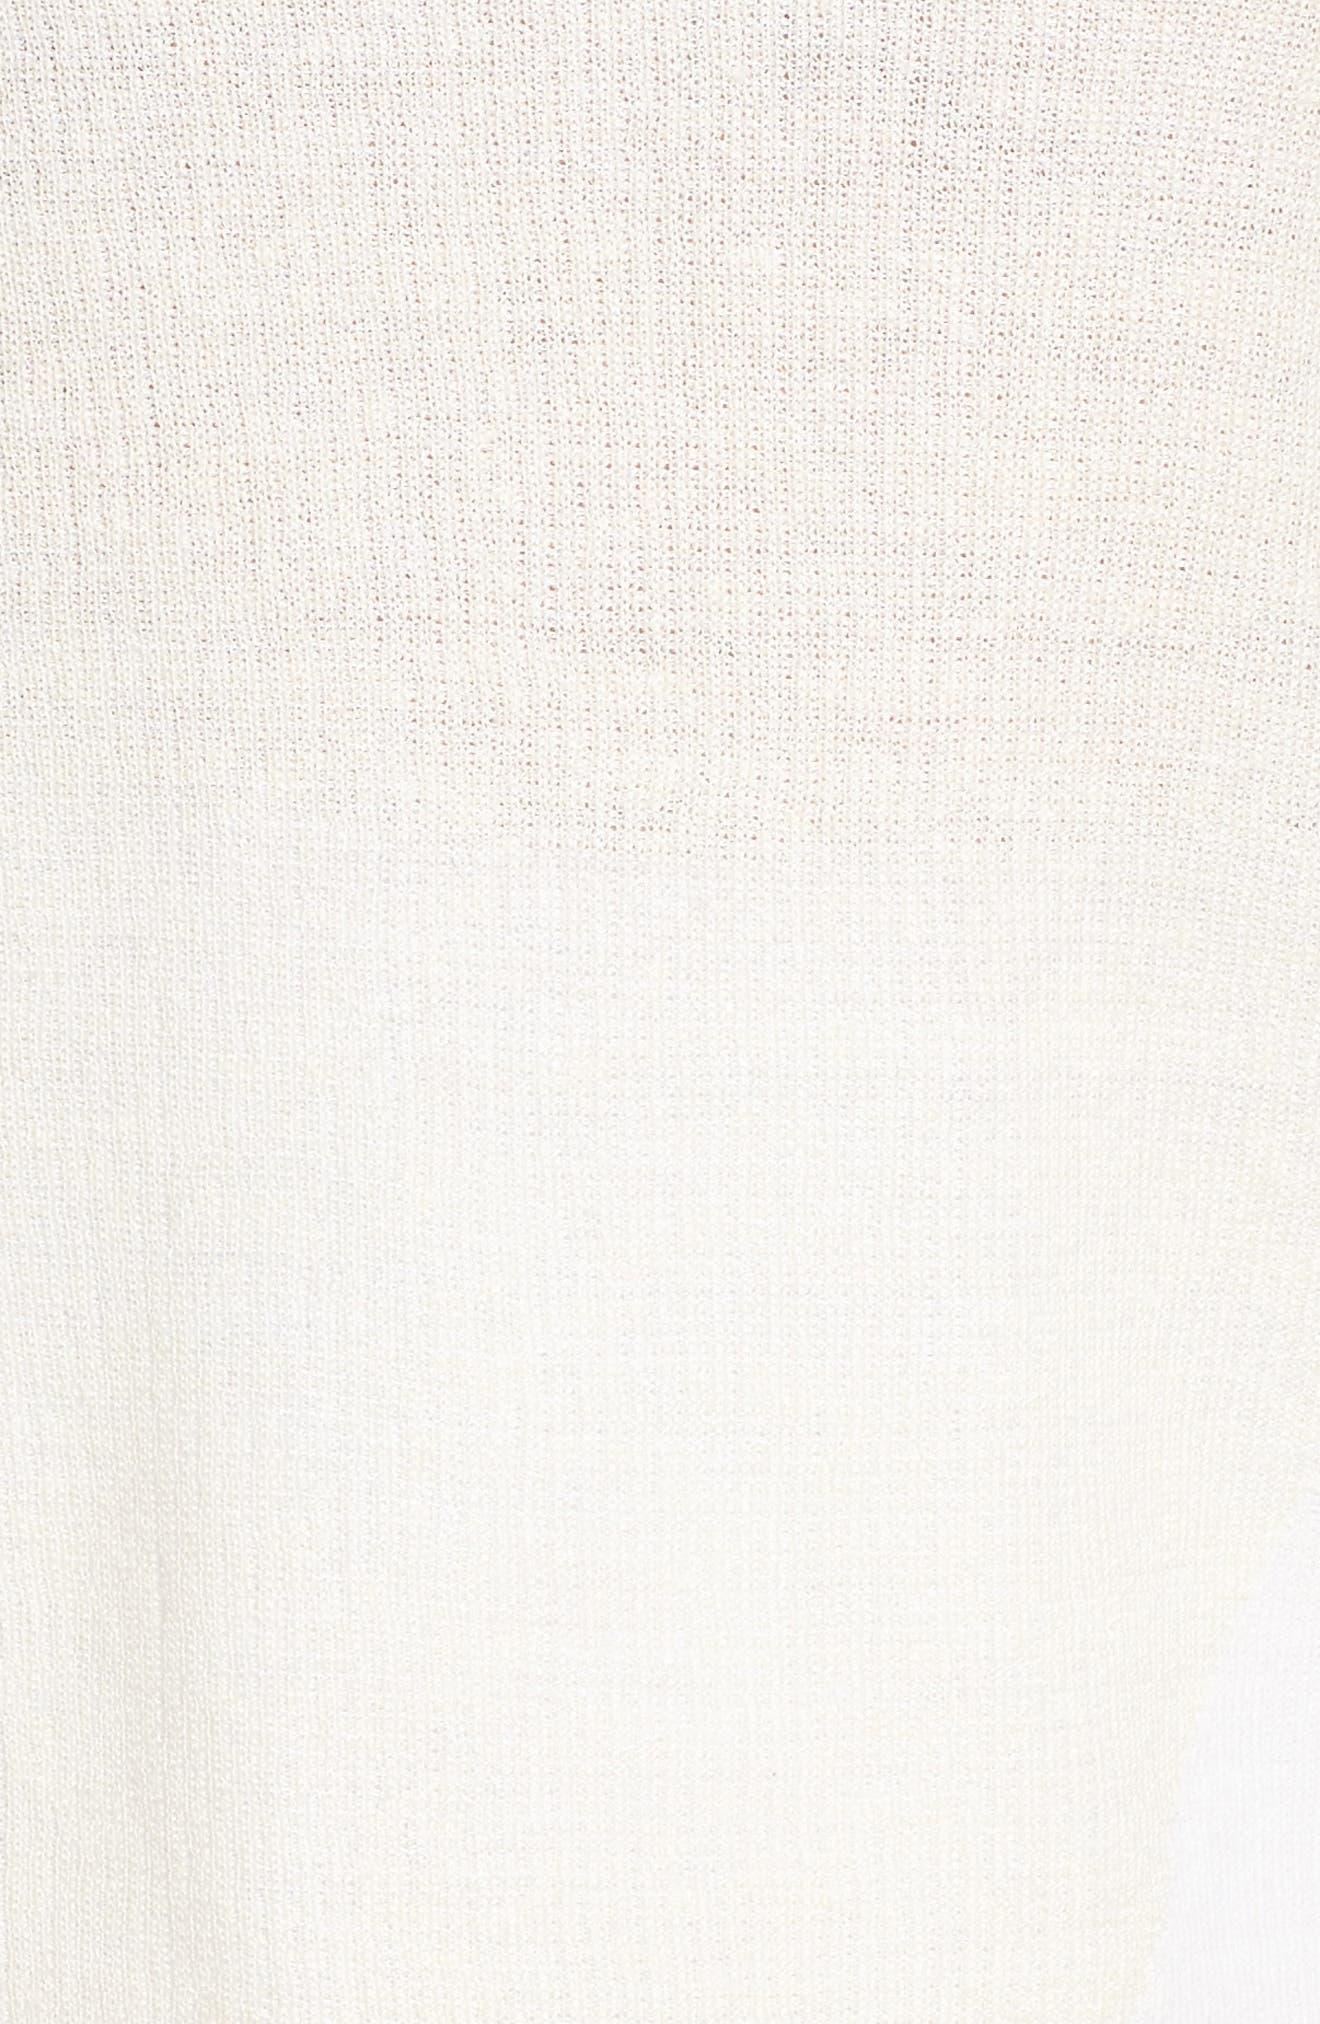 Sunlight Chiffon Trim Linen Blend Sweater,                             Alternate thumbnail 5, color,                             Multi